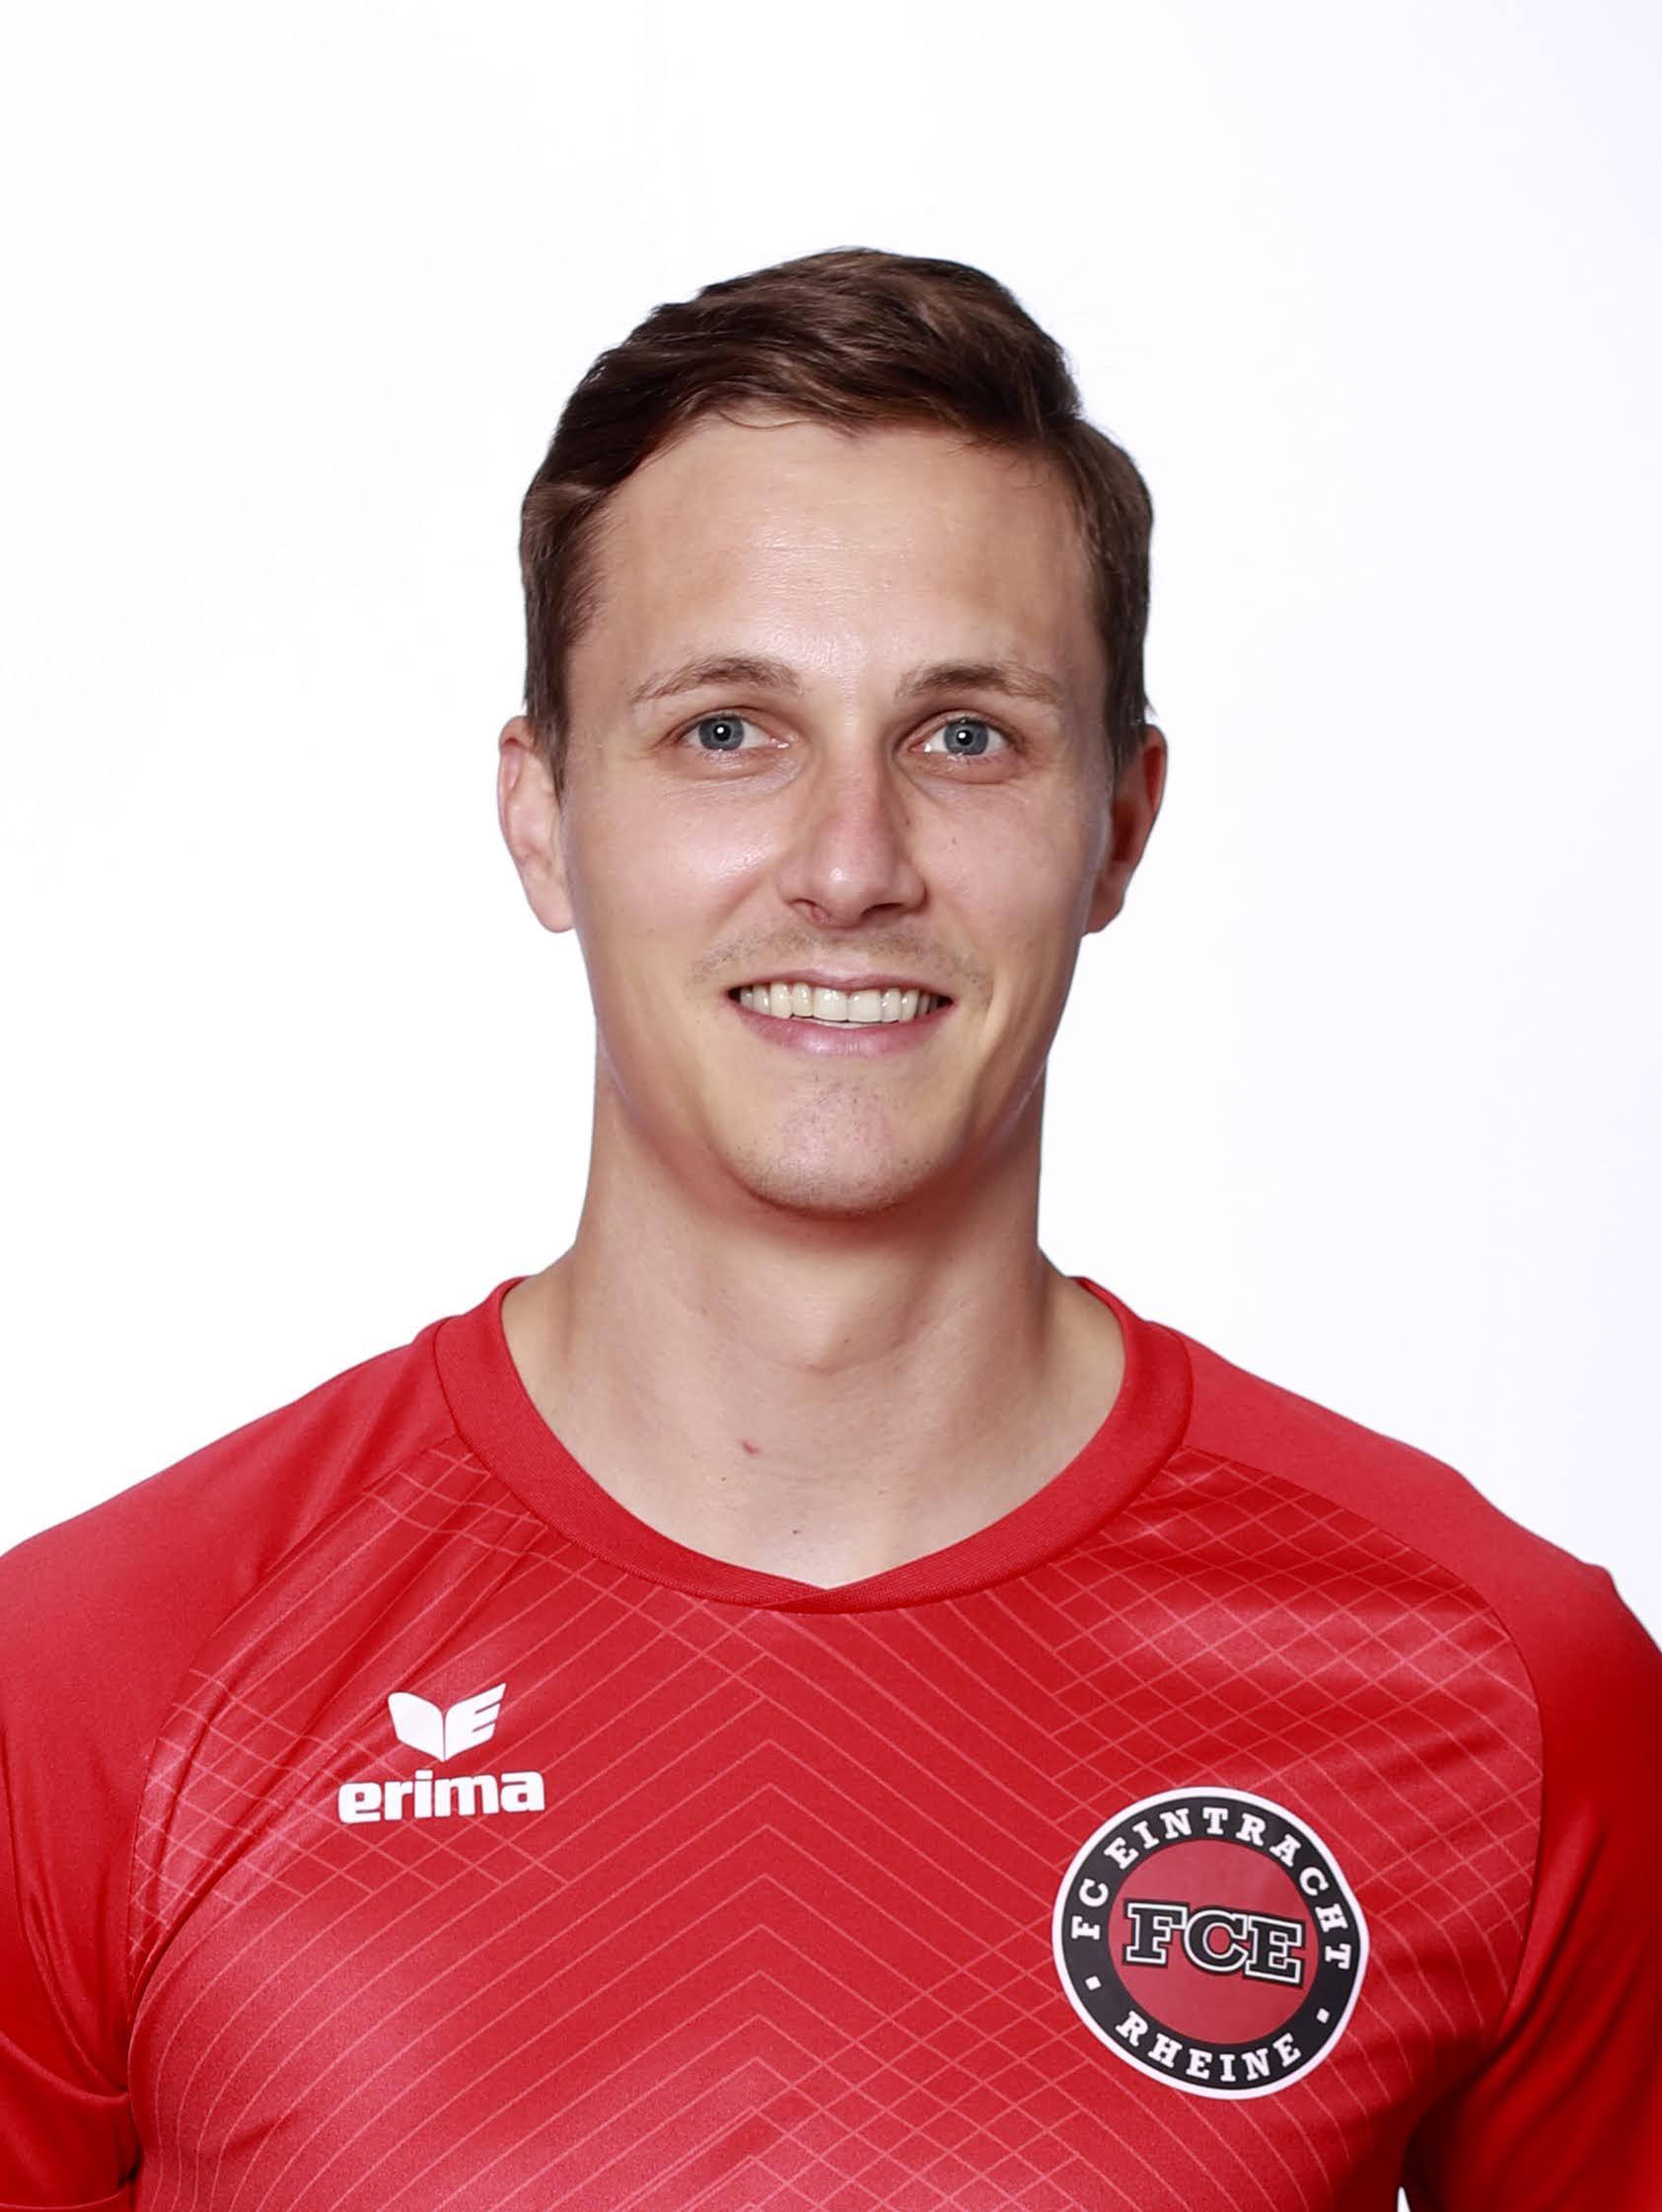 Timo Scherping